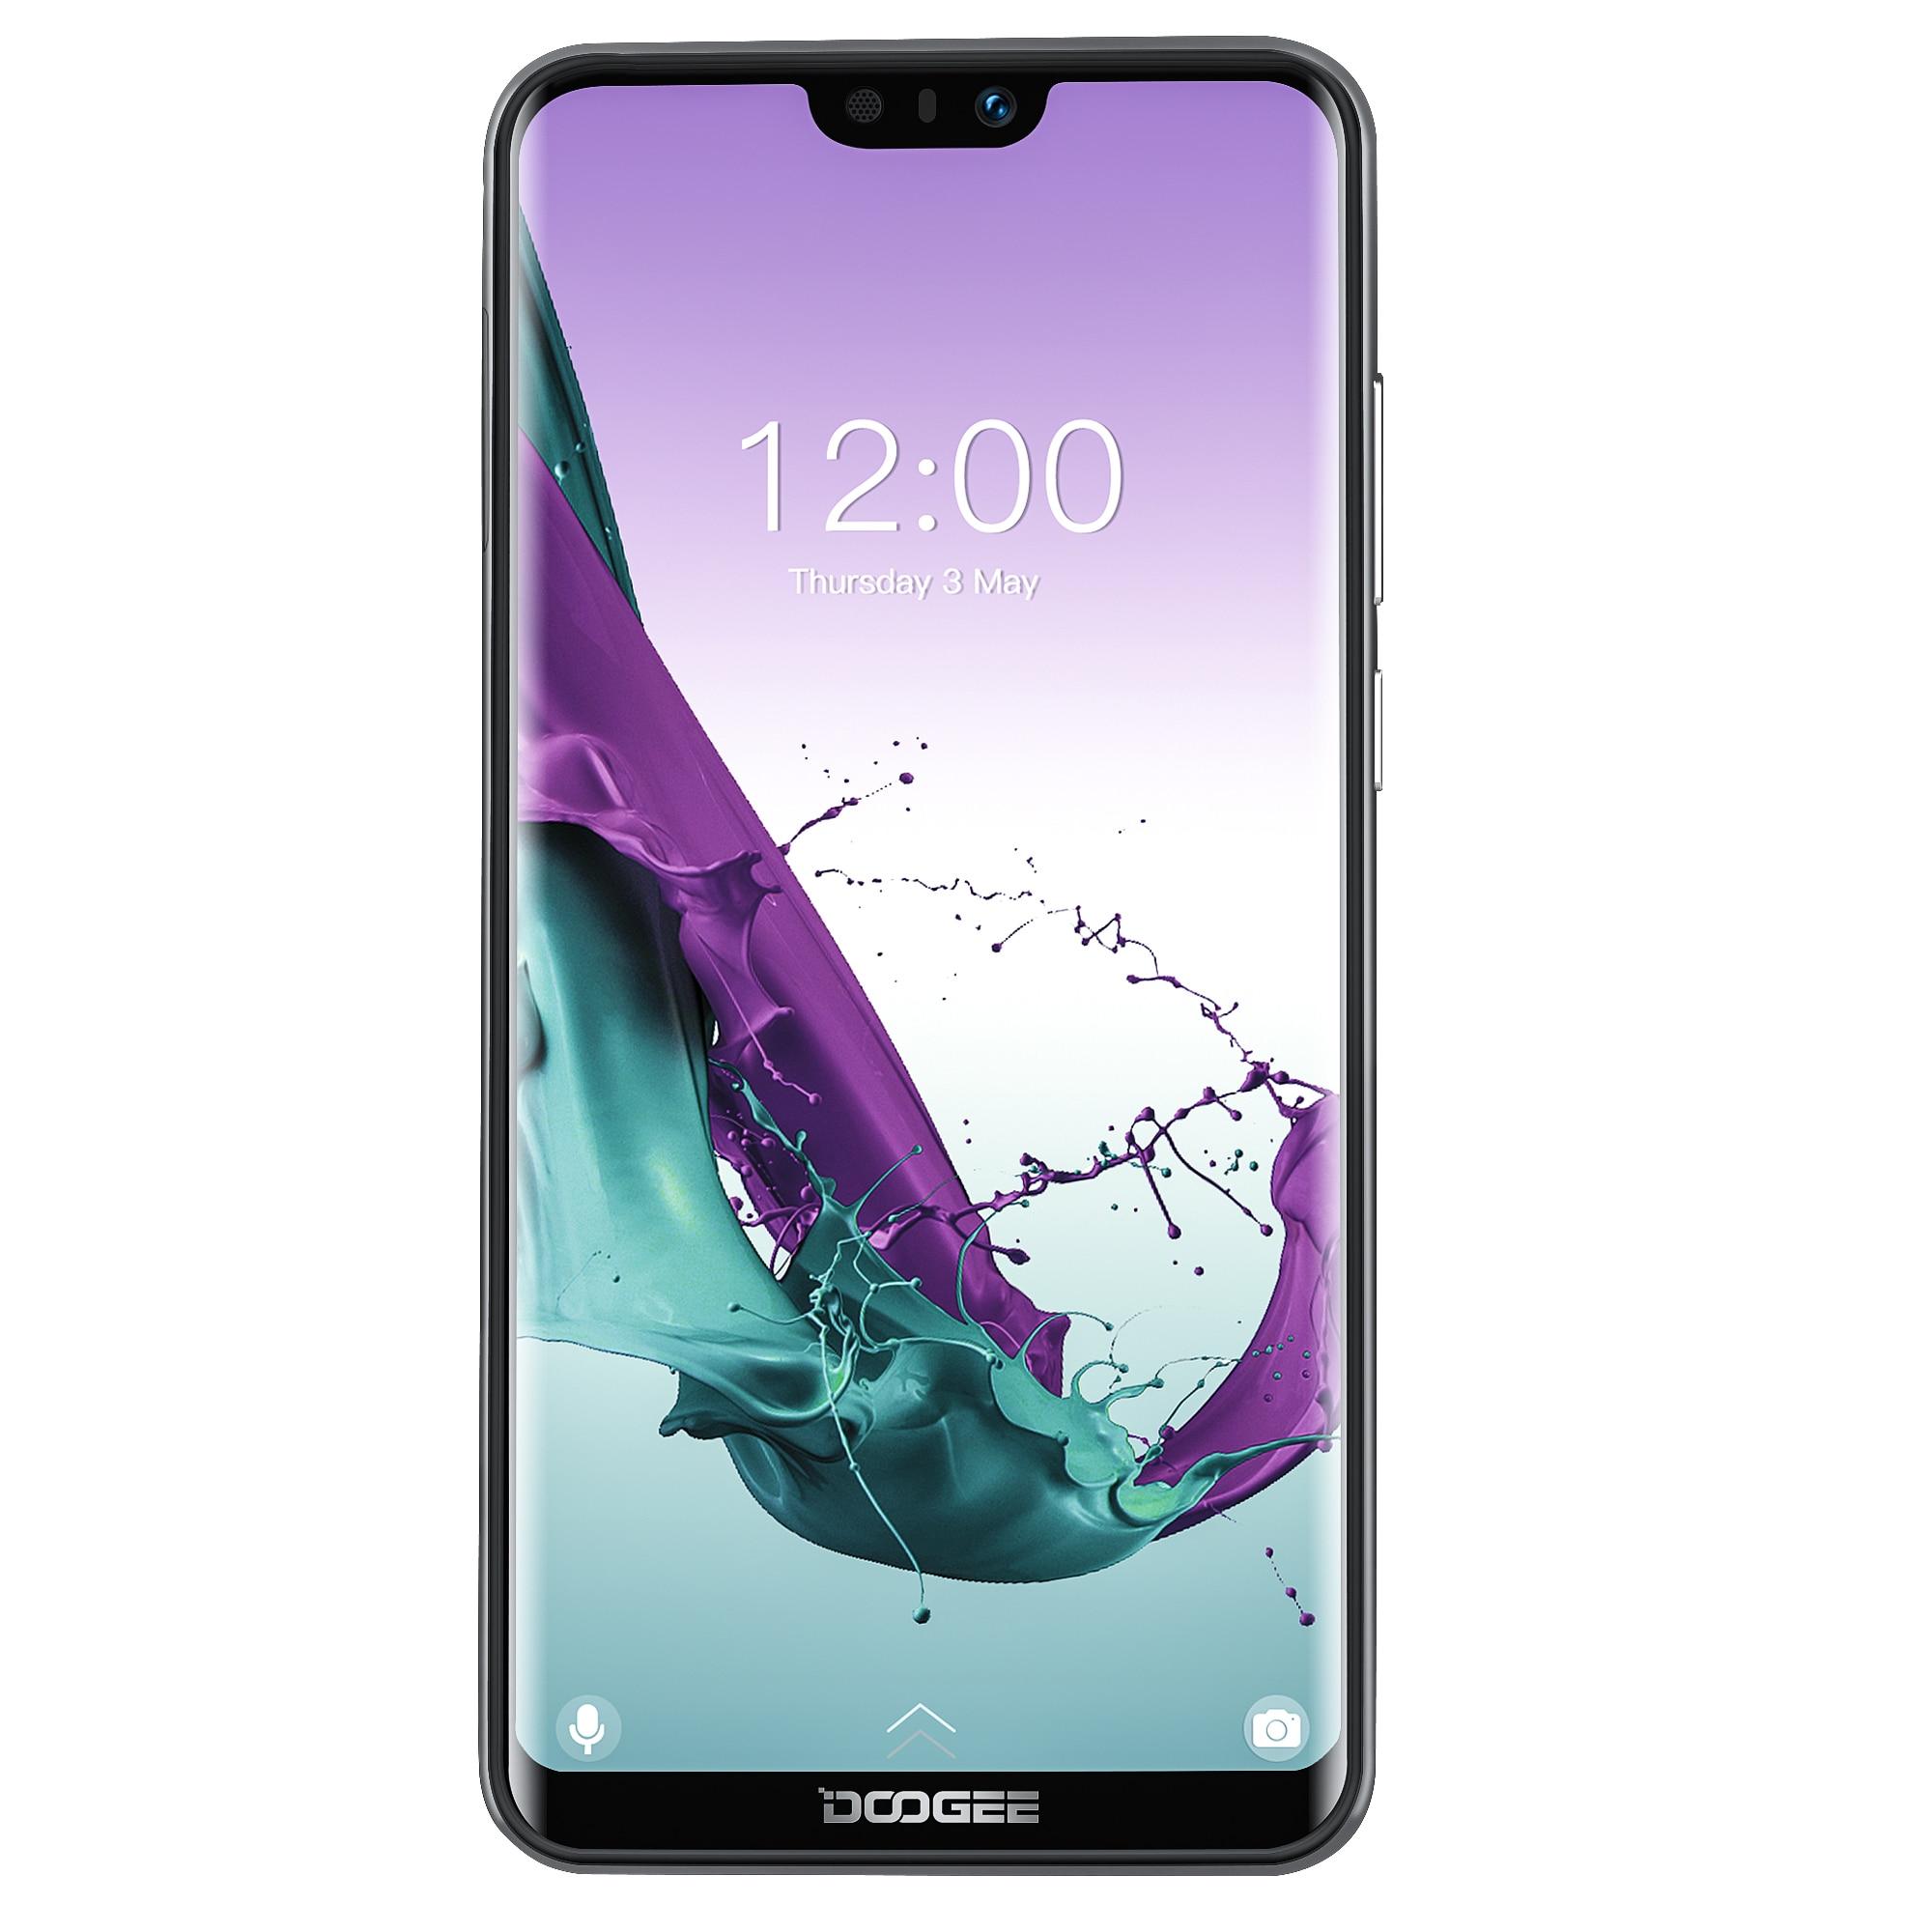 DOOGEE N10 2019 Android 8.14G LTE Handy 5,84 zoll Octa Core 3GB RAM 32GB ROM FHD 19:9 display 16.0MP Vorne Kamera 3360mAh